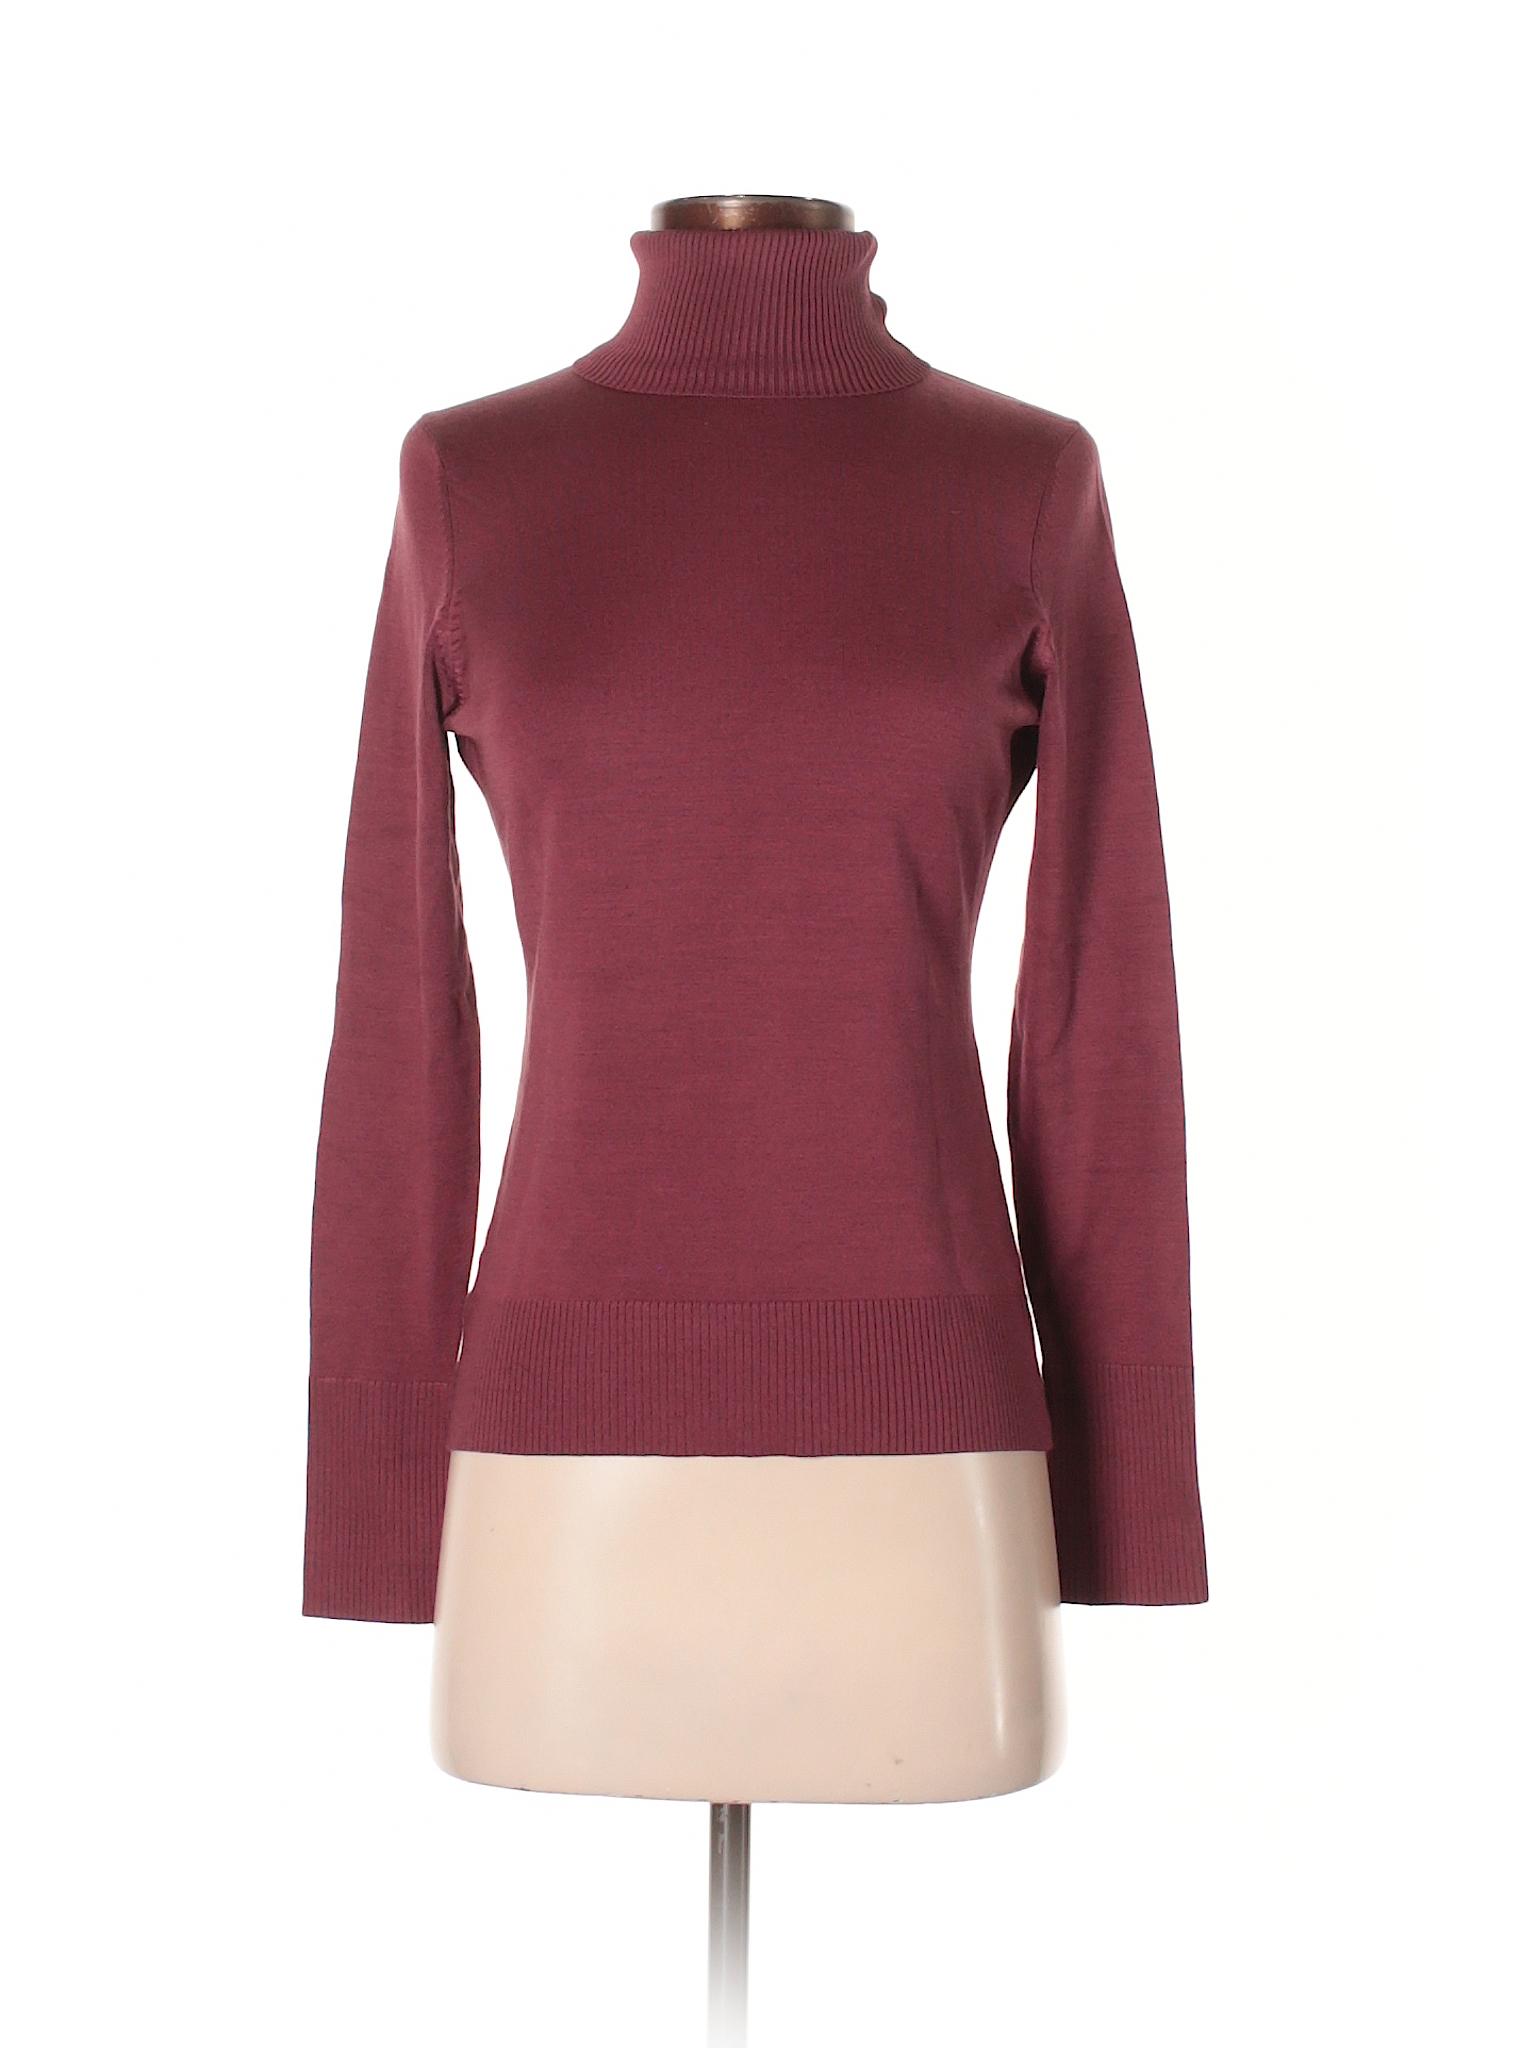 Silk LOFT Ann Sweater Boutique Pullover Taylor 40pvqAwxAT